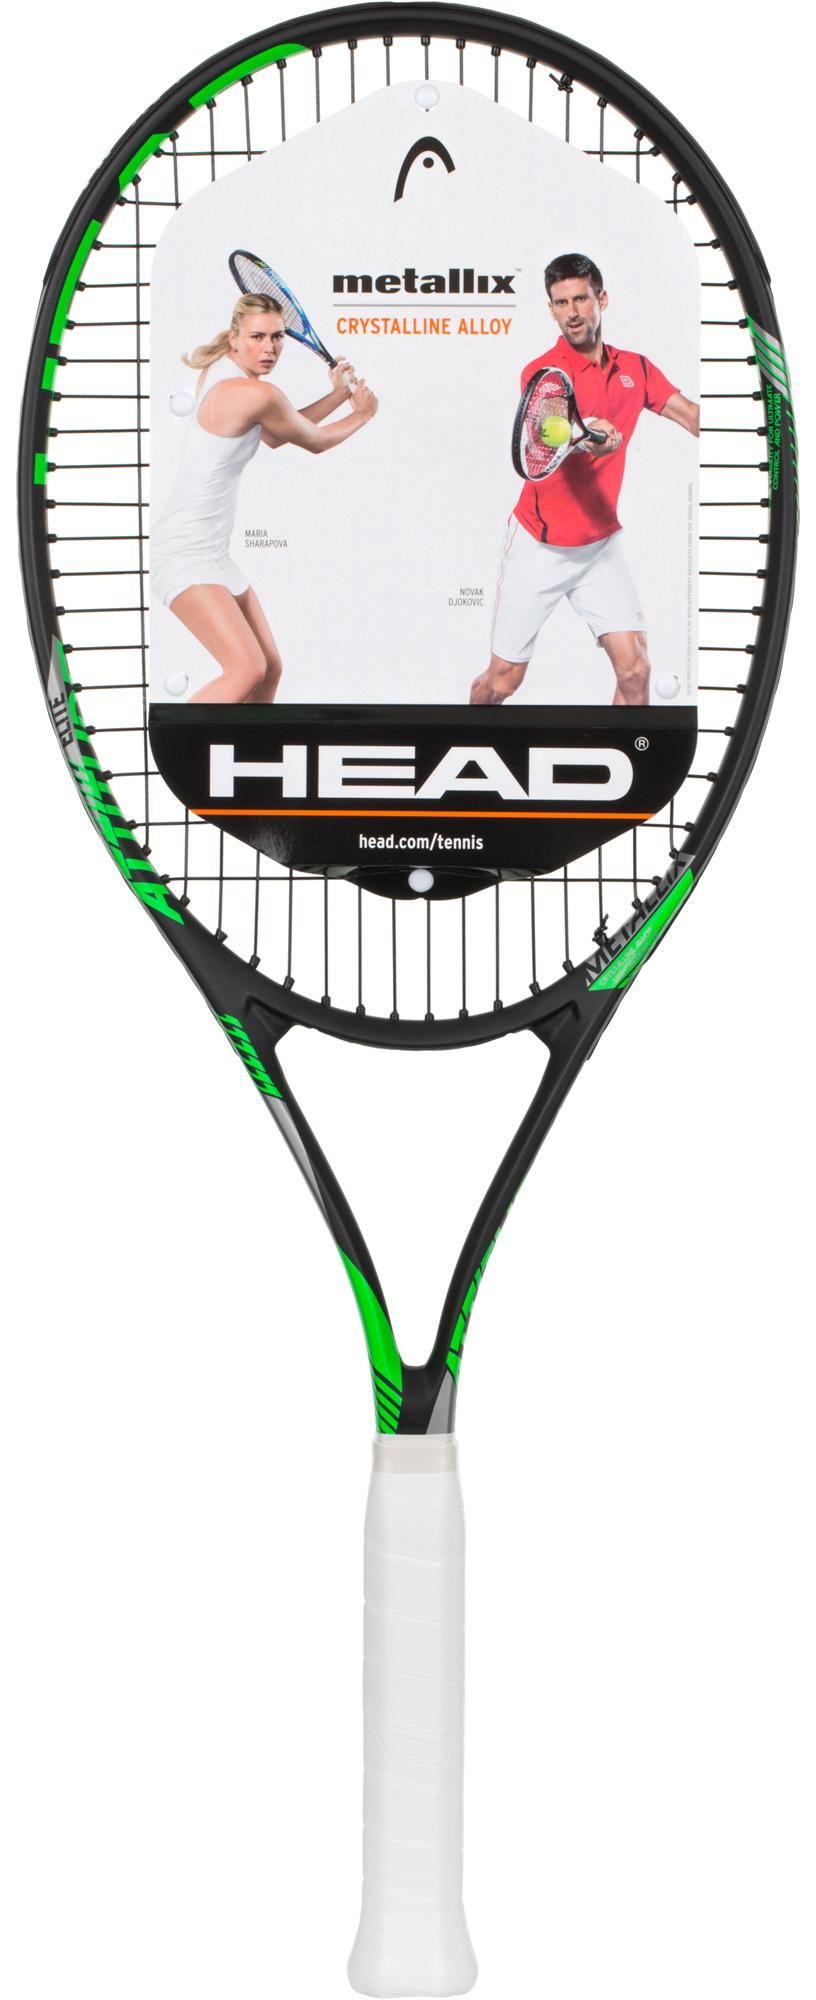 Head Ракетка для большого тенниса Head MX Attitude Elite, размер 3 head ракетка для большого тенниса детская head novak 21 размер без размера